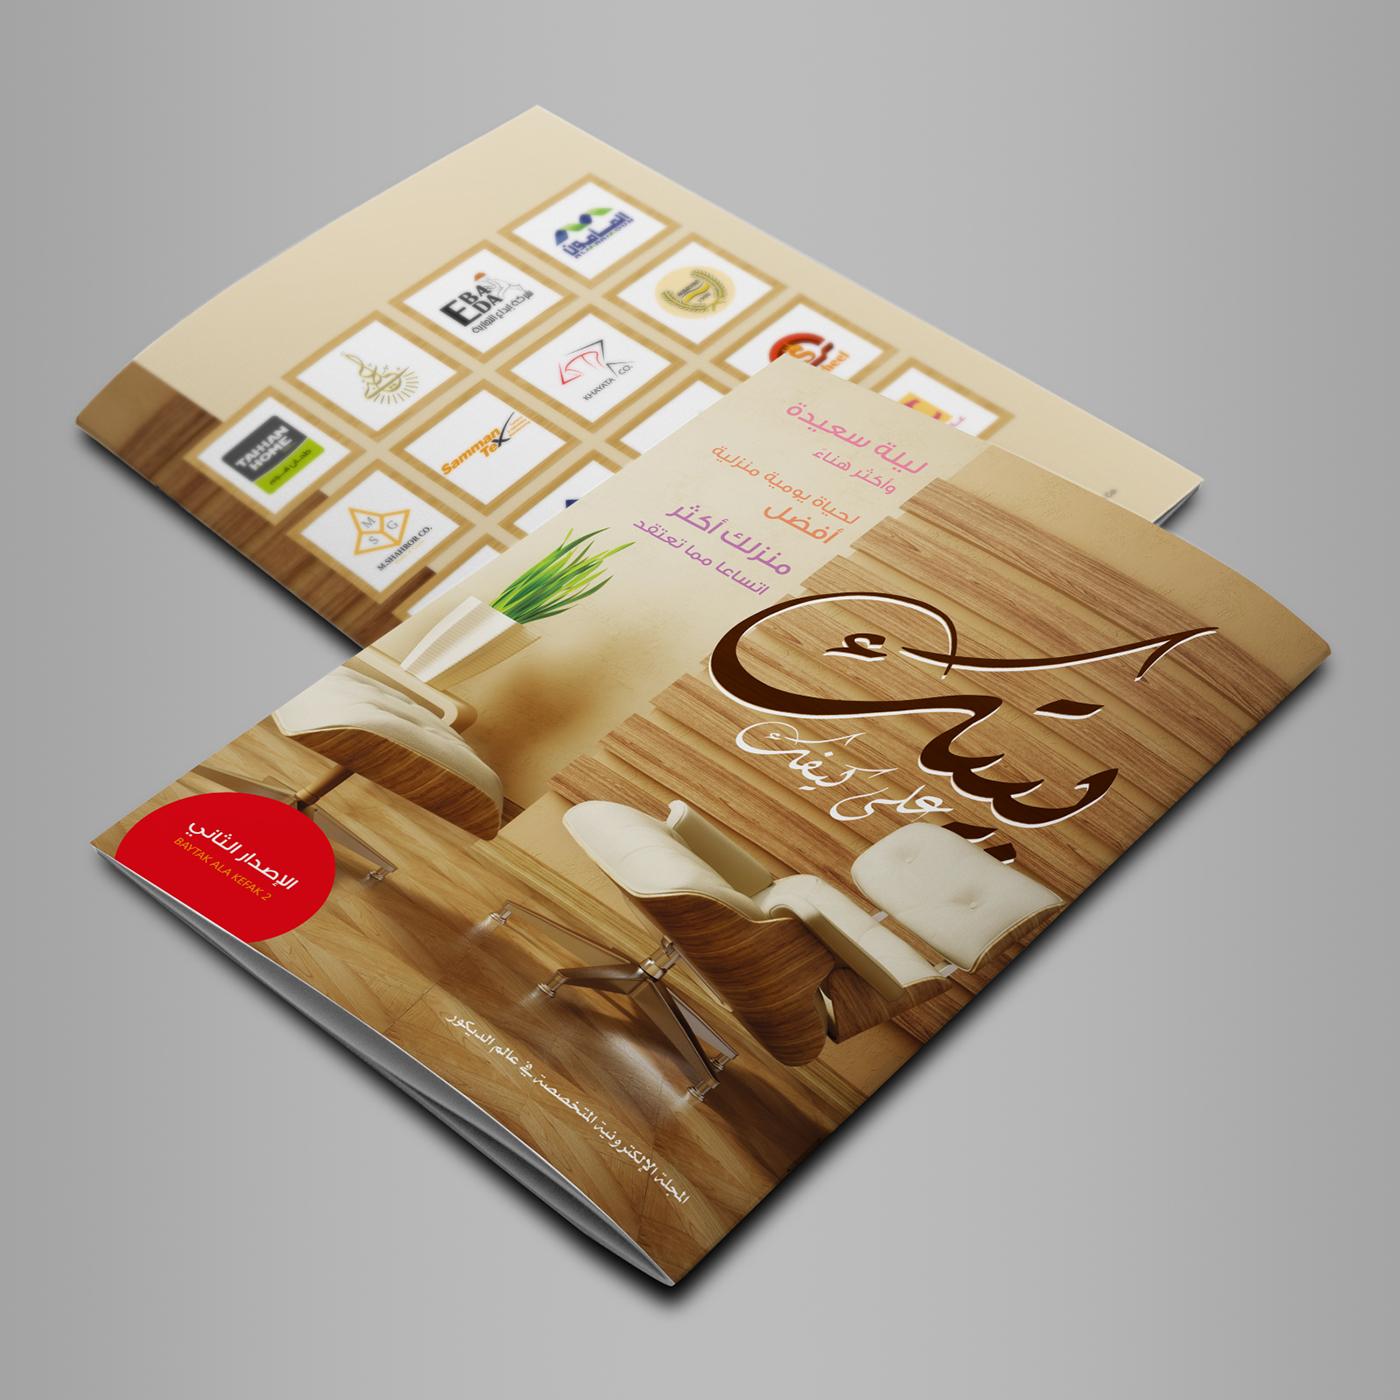 magazine zeitschrift catalog katalog Catalogue